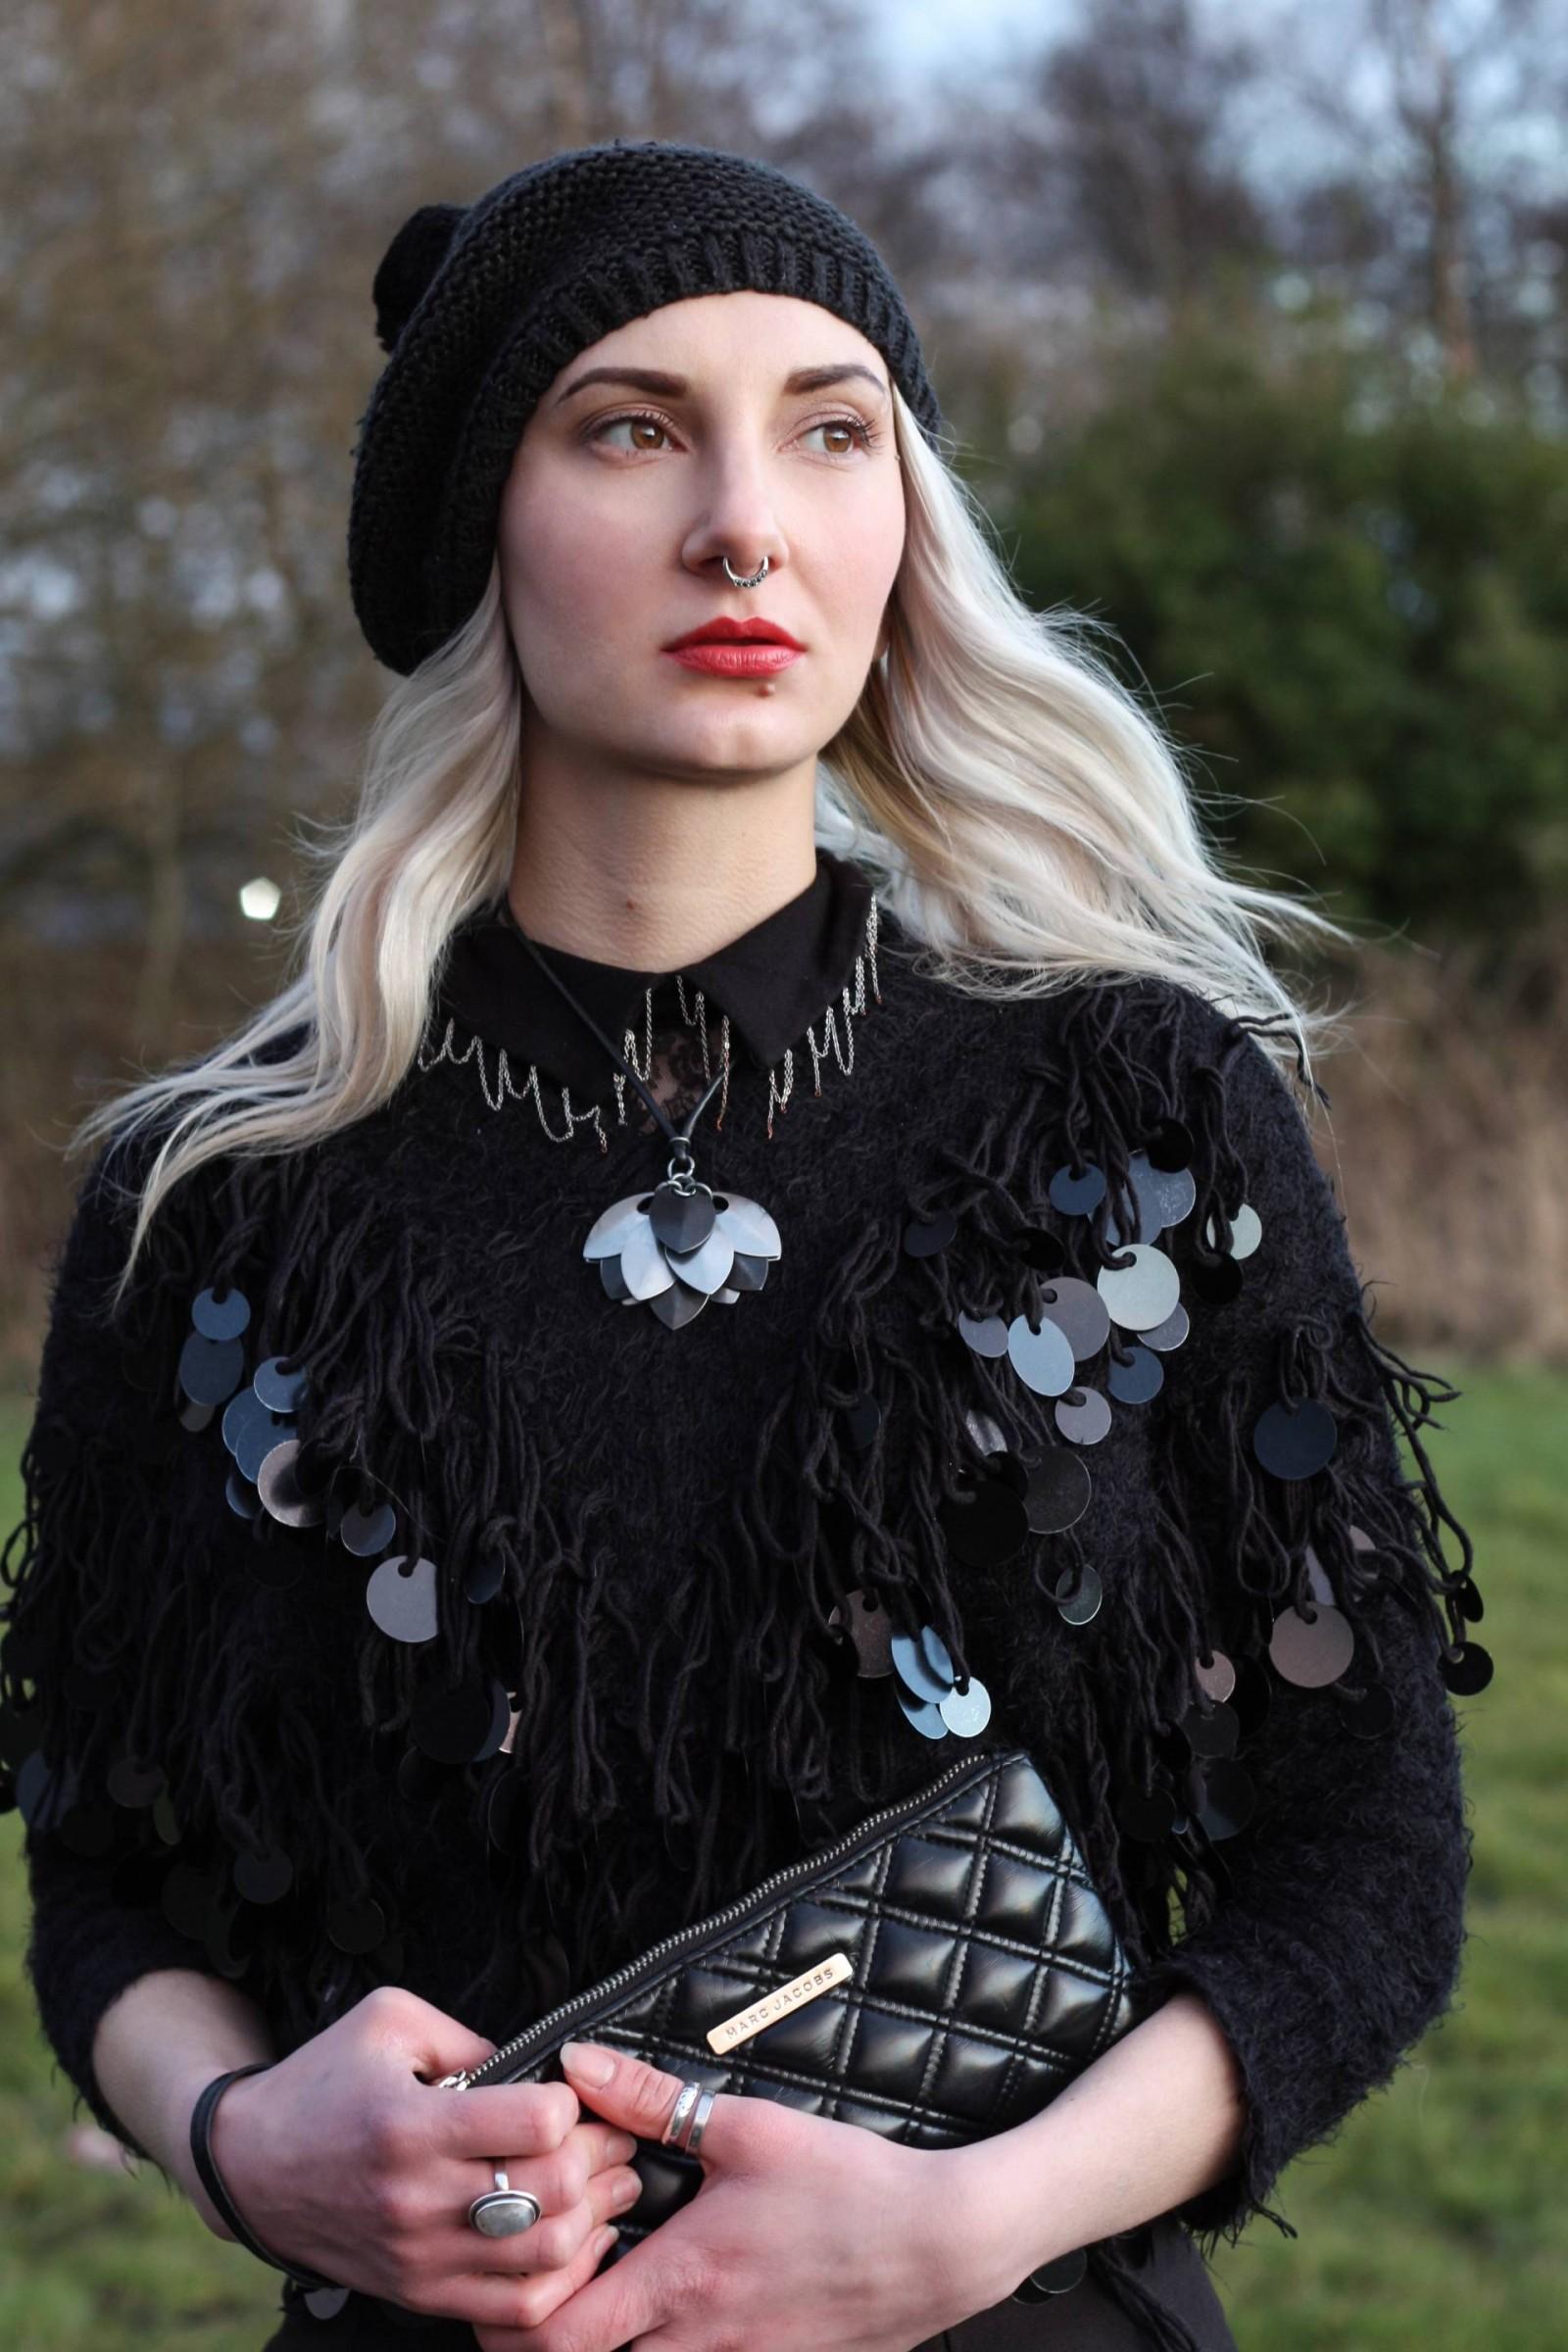 dark style blogger textured juper with chains sunset 5